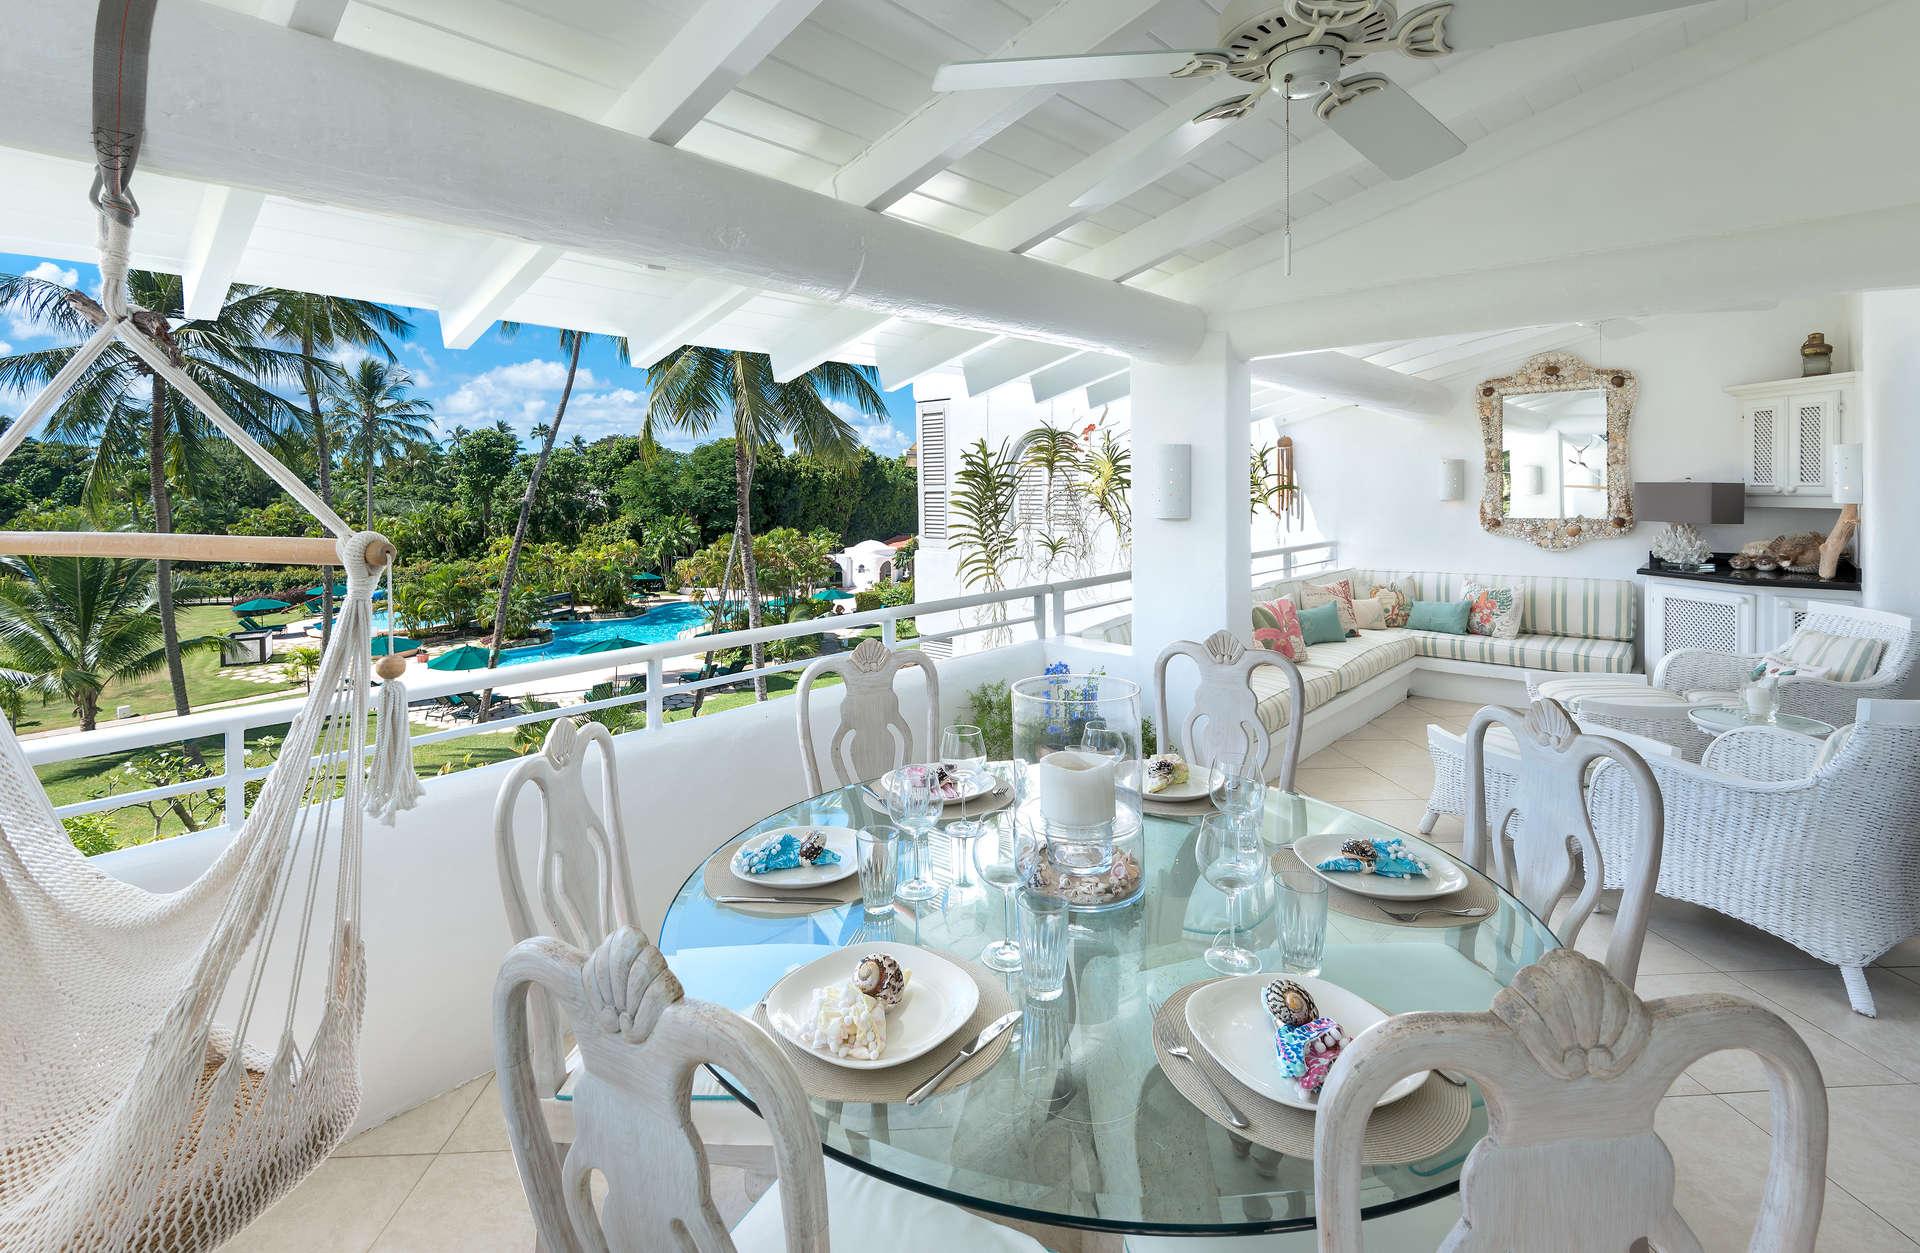 Luxury villa rentals caribbean - Barbados - St james - Porters - Glitter Bay 310 | Mareje's Strand - Image 1/7